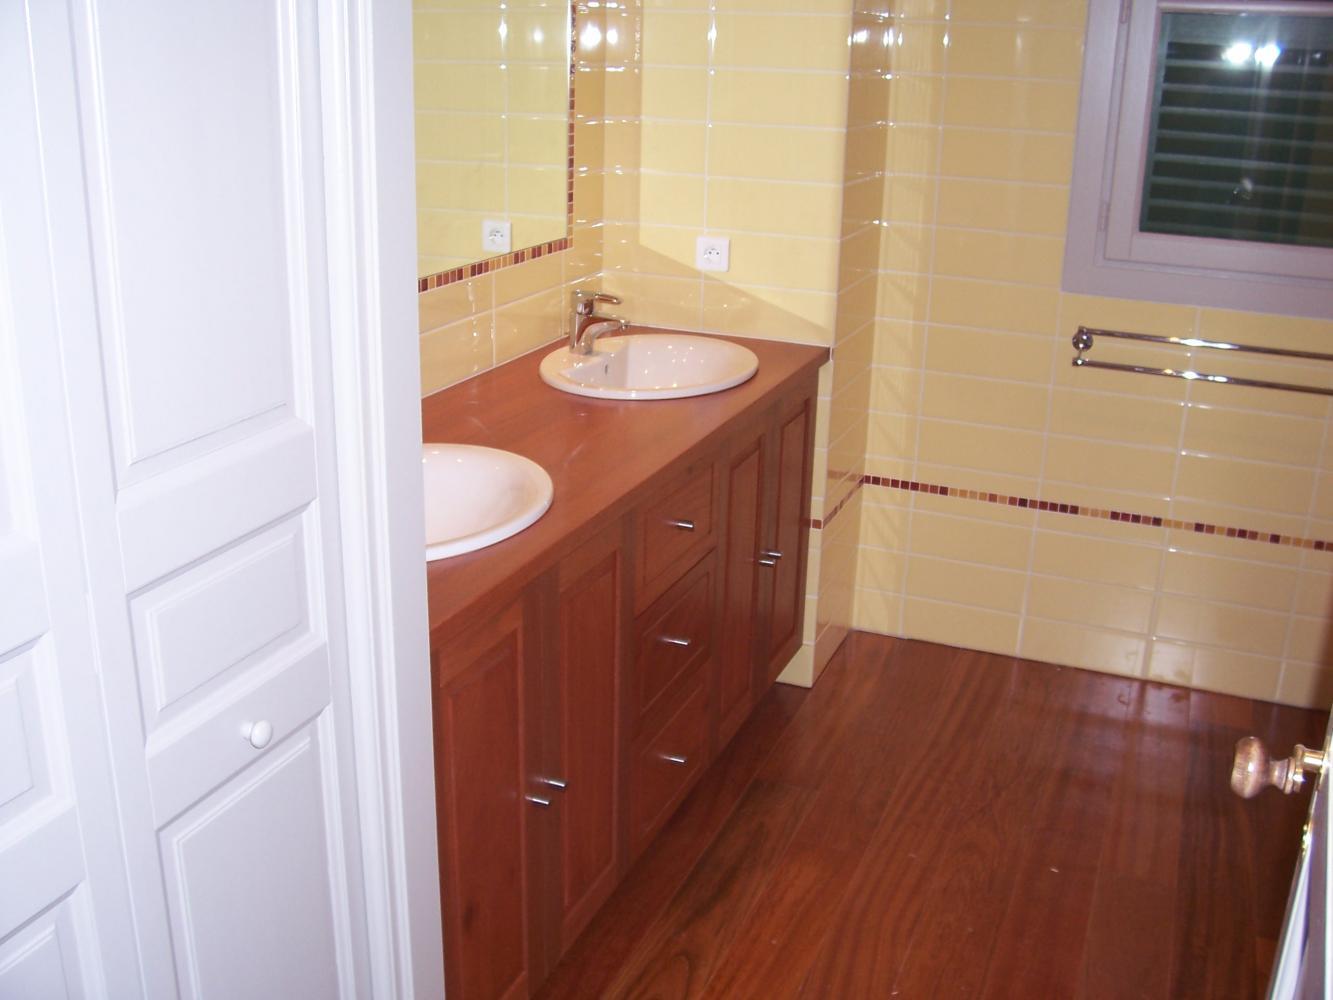 Agencement placards salle de bains for Placard salle de bain